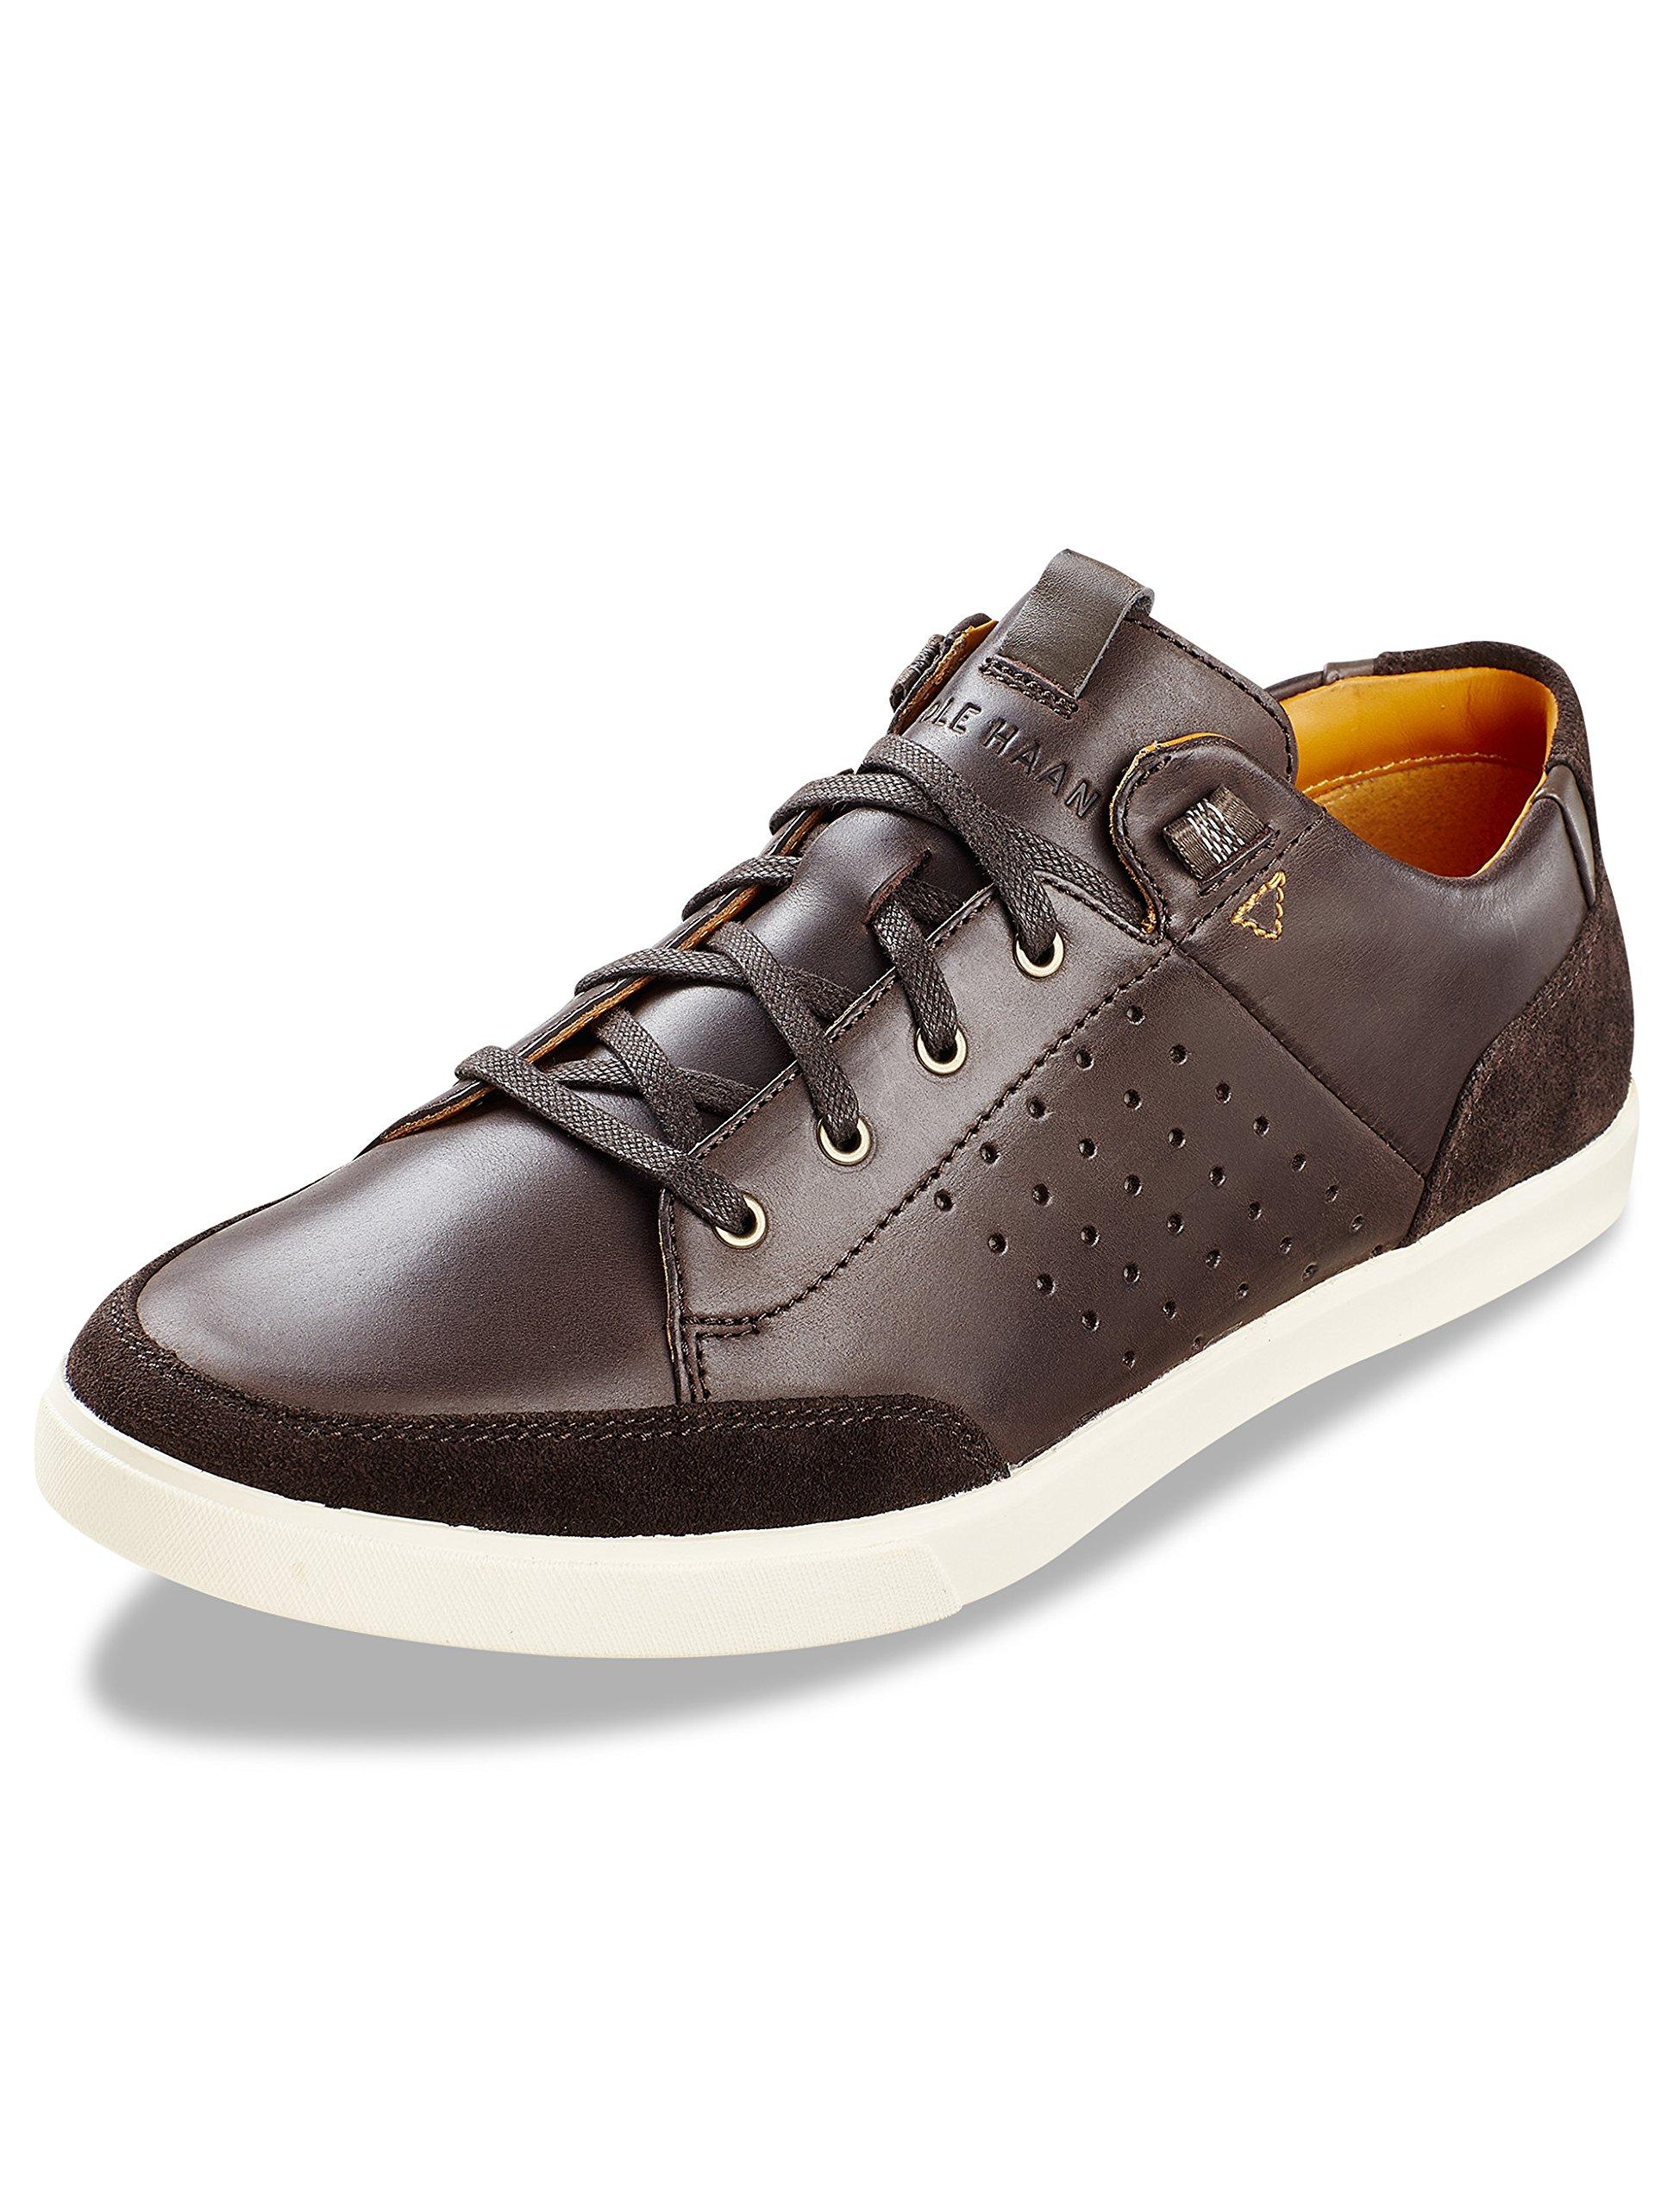 Cole Haan Men's Owen Sport Oxford Shoe Dark Roast Size 11